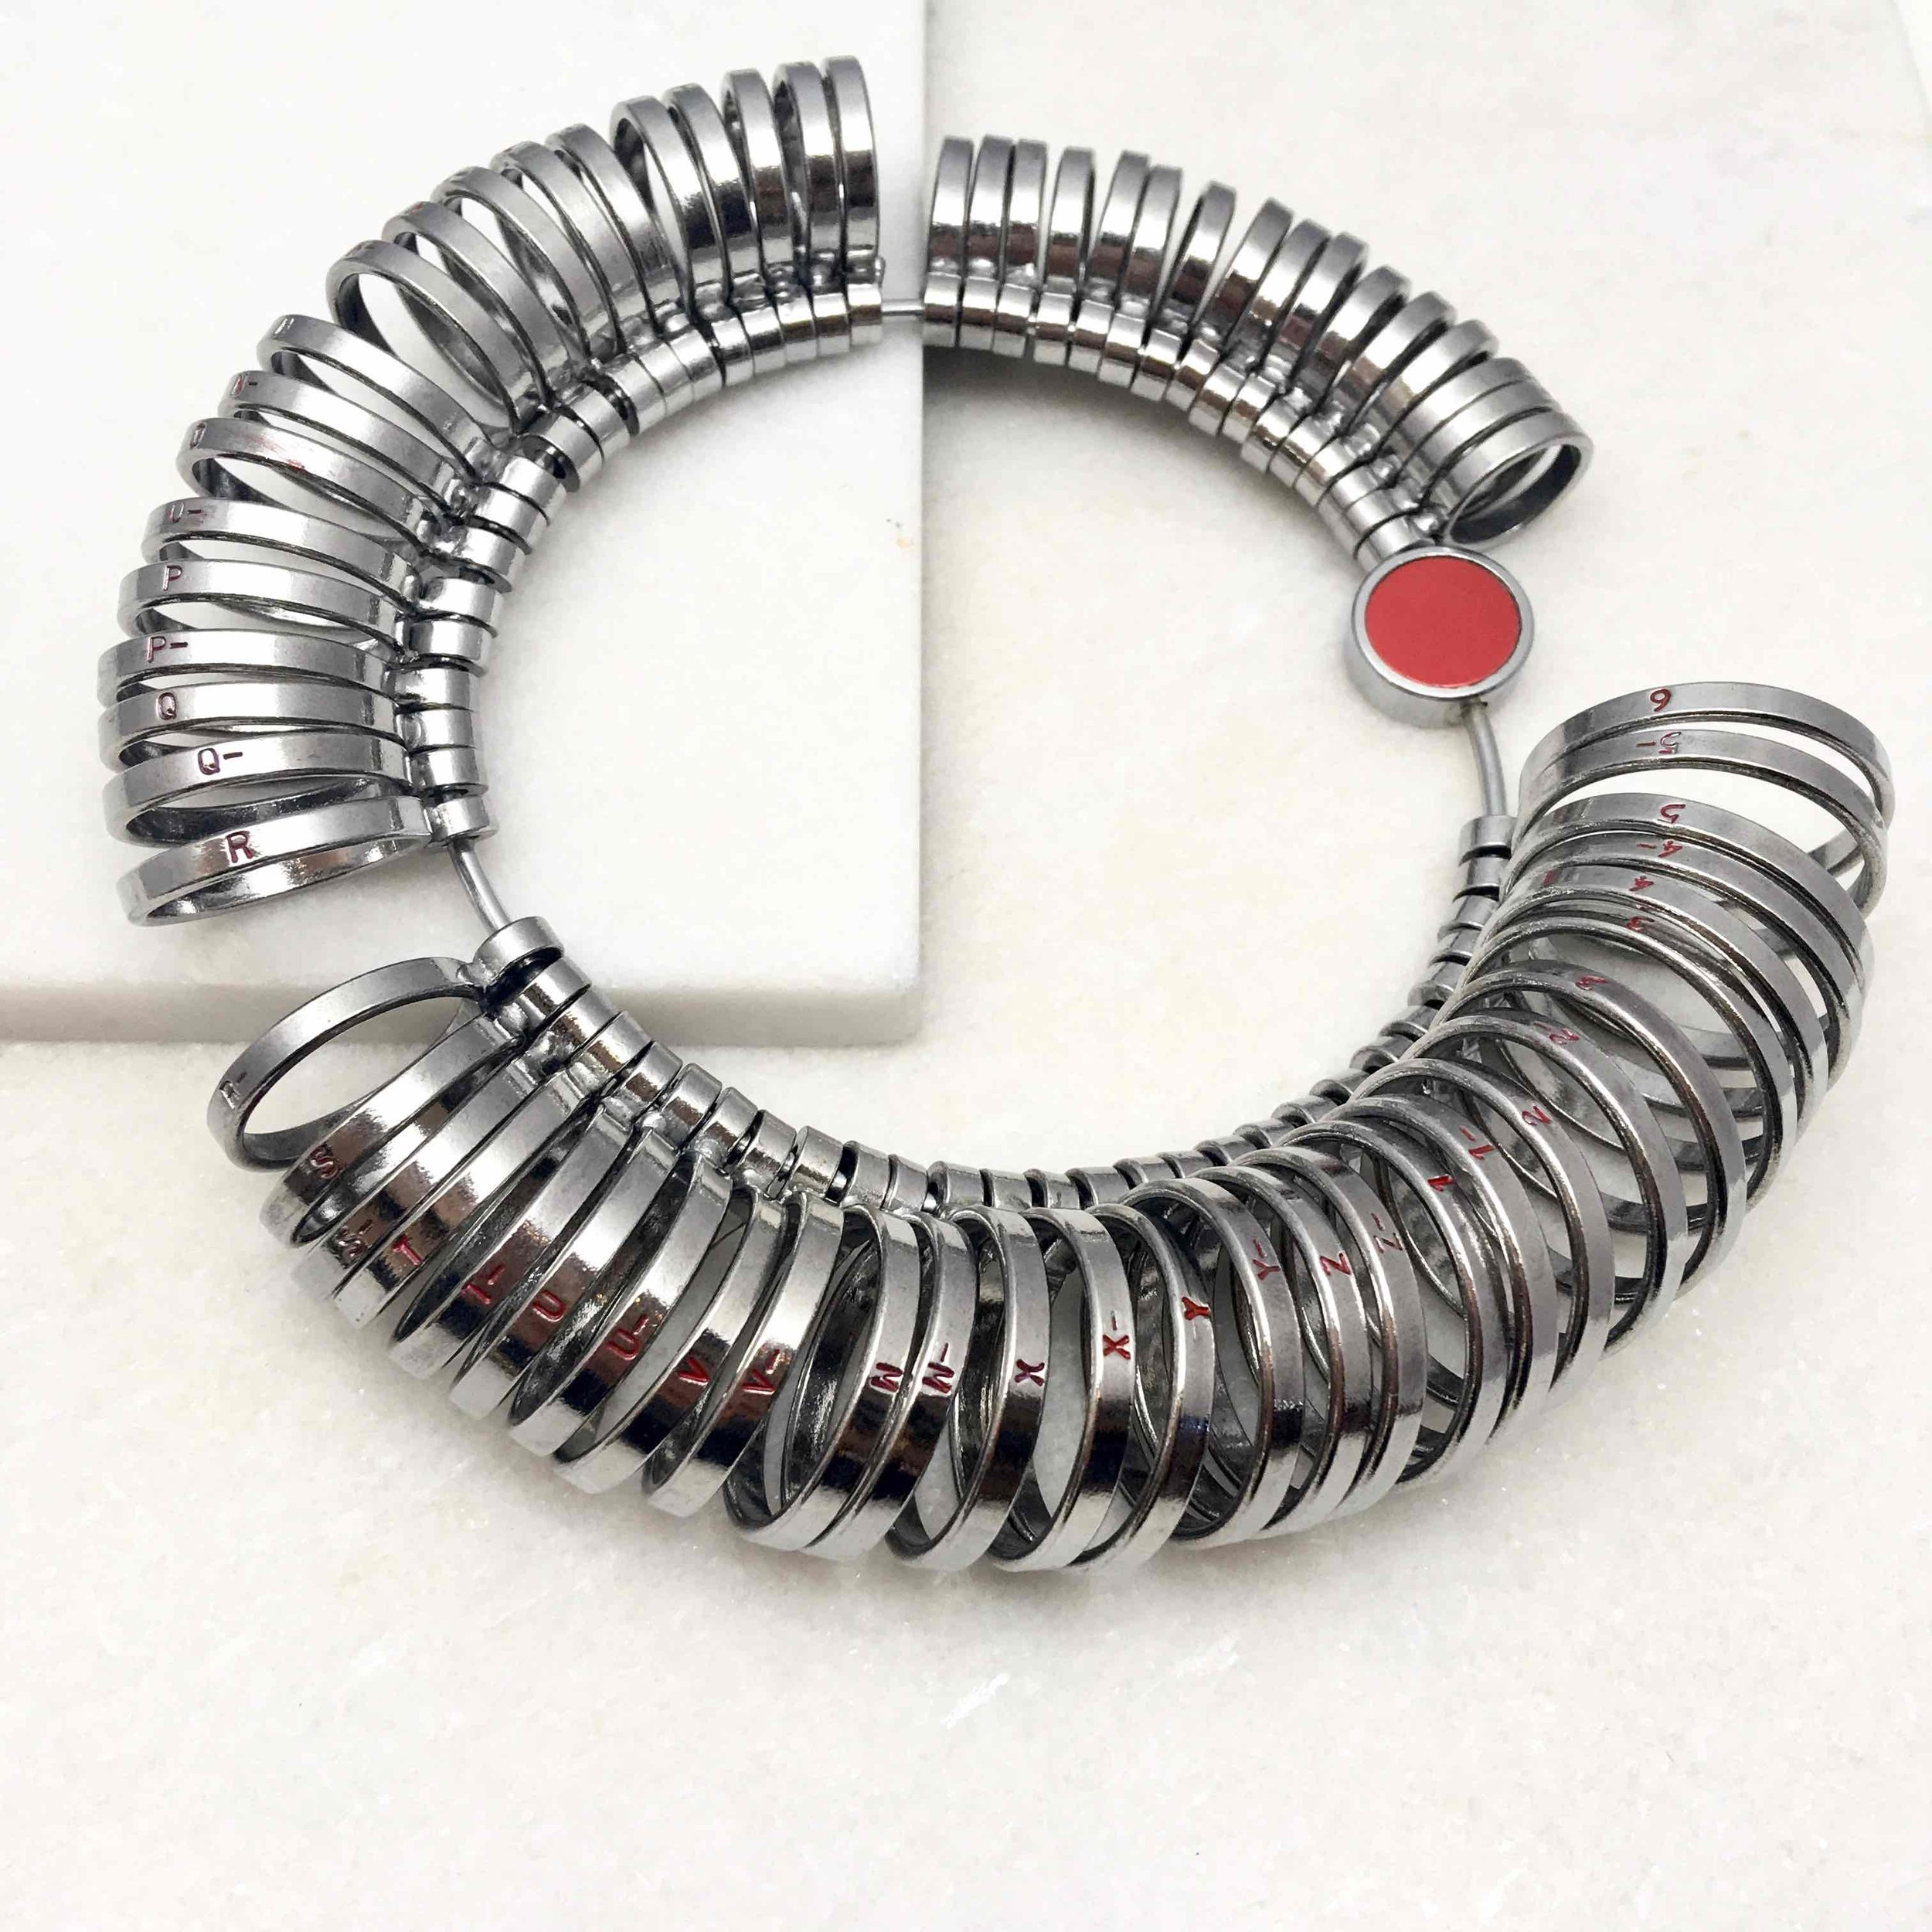 ring sizers.jpg